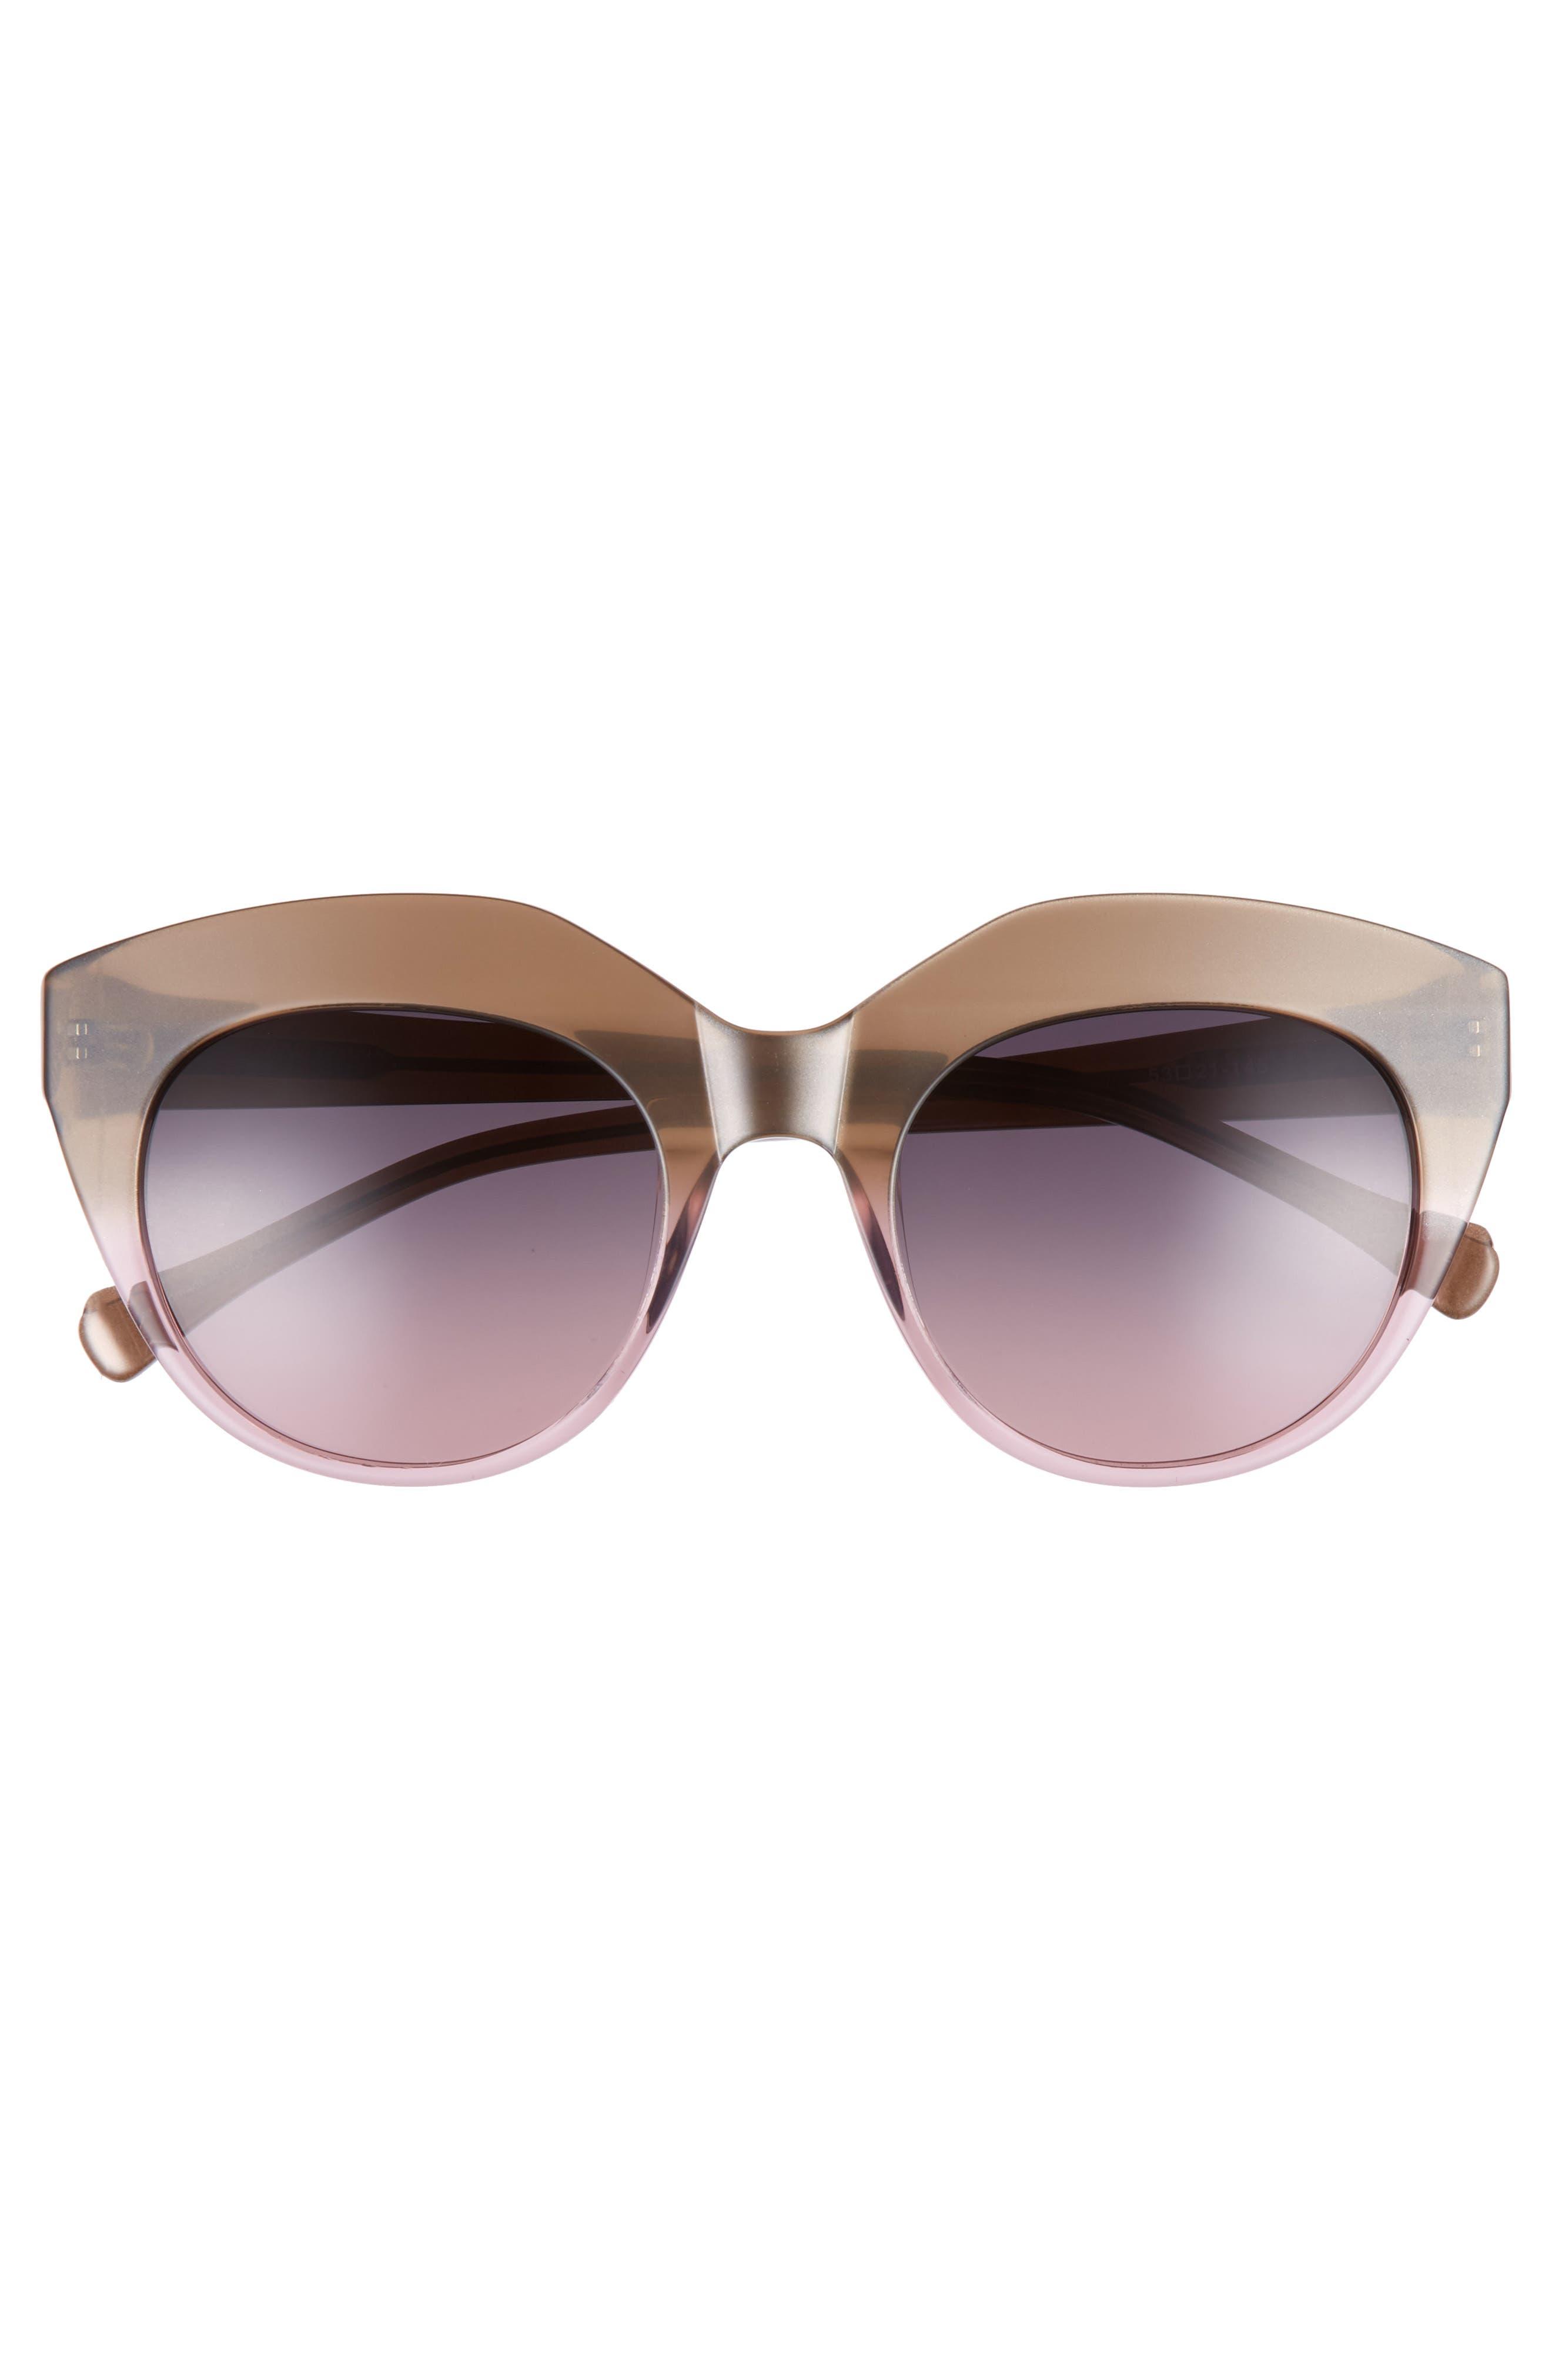 Tamika 53mm Polarized Sunglasses,                             Alternate thumbnail 3, color,                             Dessert/ Berry